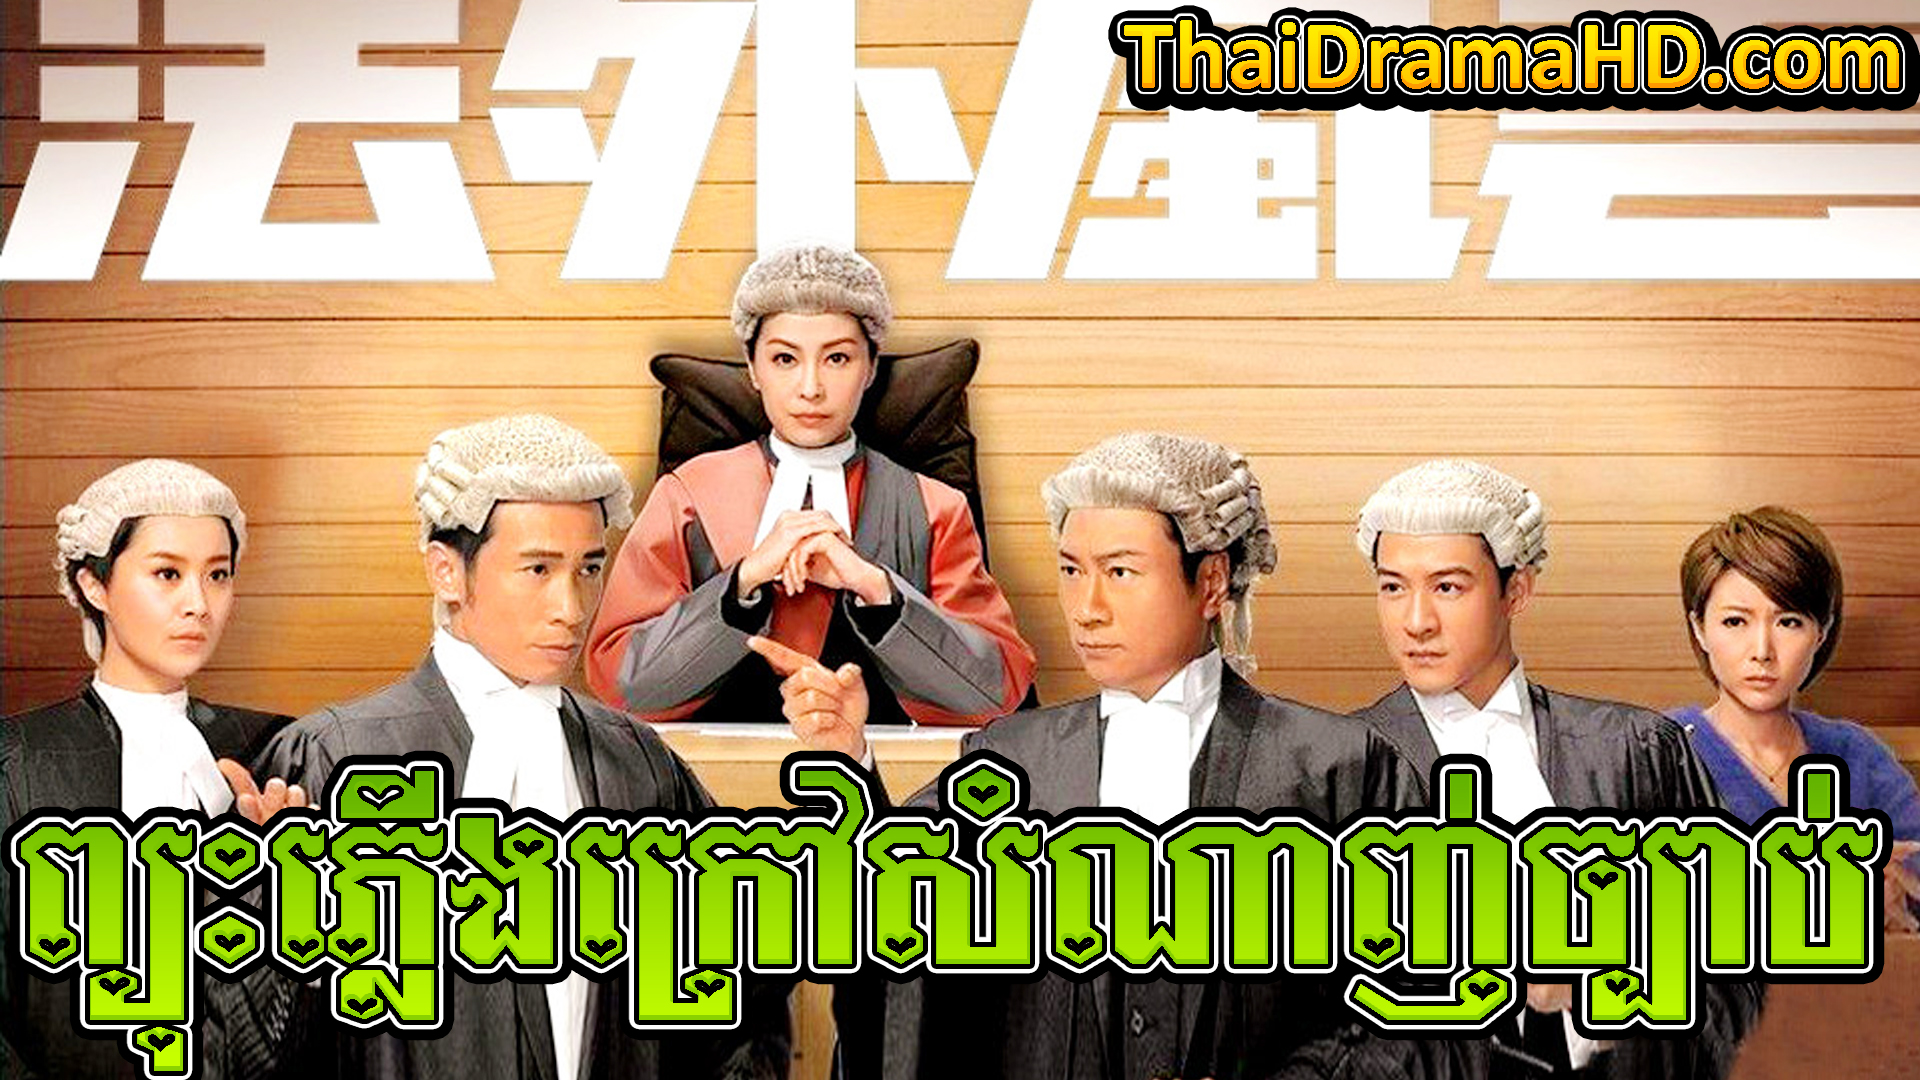 Phyouh Phleung Krao Samnanh Chbab | Thai Drama | Khmer Movie | Phumikhmer | movie-khmer | video4khmer | khmotions | kolabkhmer | khmer drama | ksdrama | cookingtips | roscheat | khmertimeskh | khmerkomsan | phumi7 | merlkon | film2us | movie2kh | sweetdrama | khmercitylove | khreplay | tvb cambodia drama | ckh7 | srokthai | phumimedia | phumi8 | khmer avenue | khmer search | Soyo | khmerfans